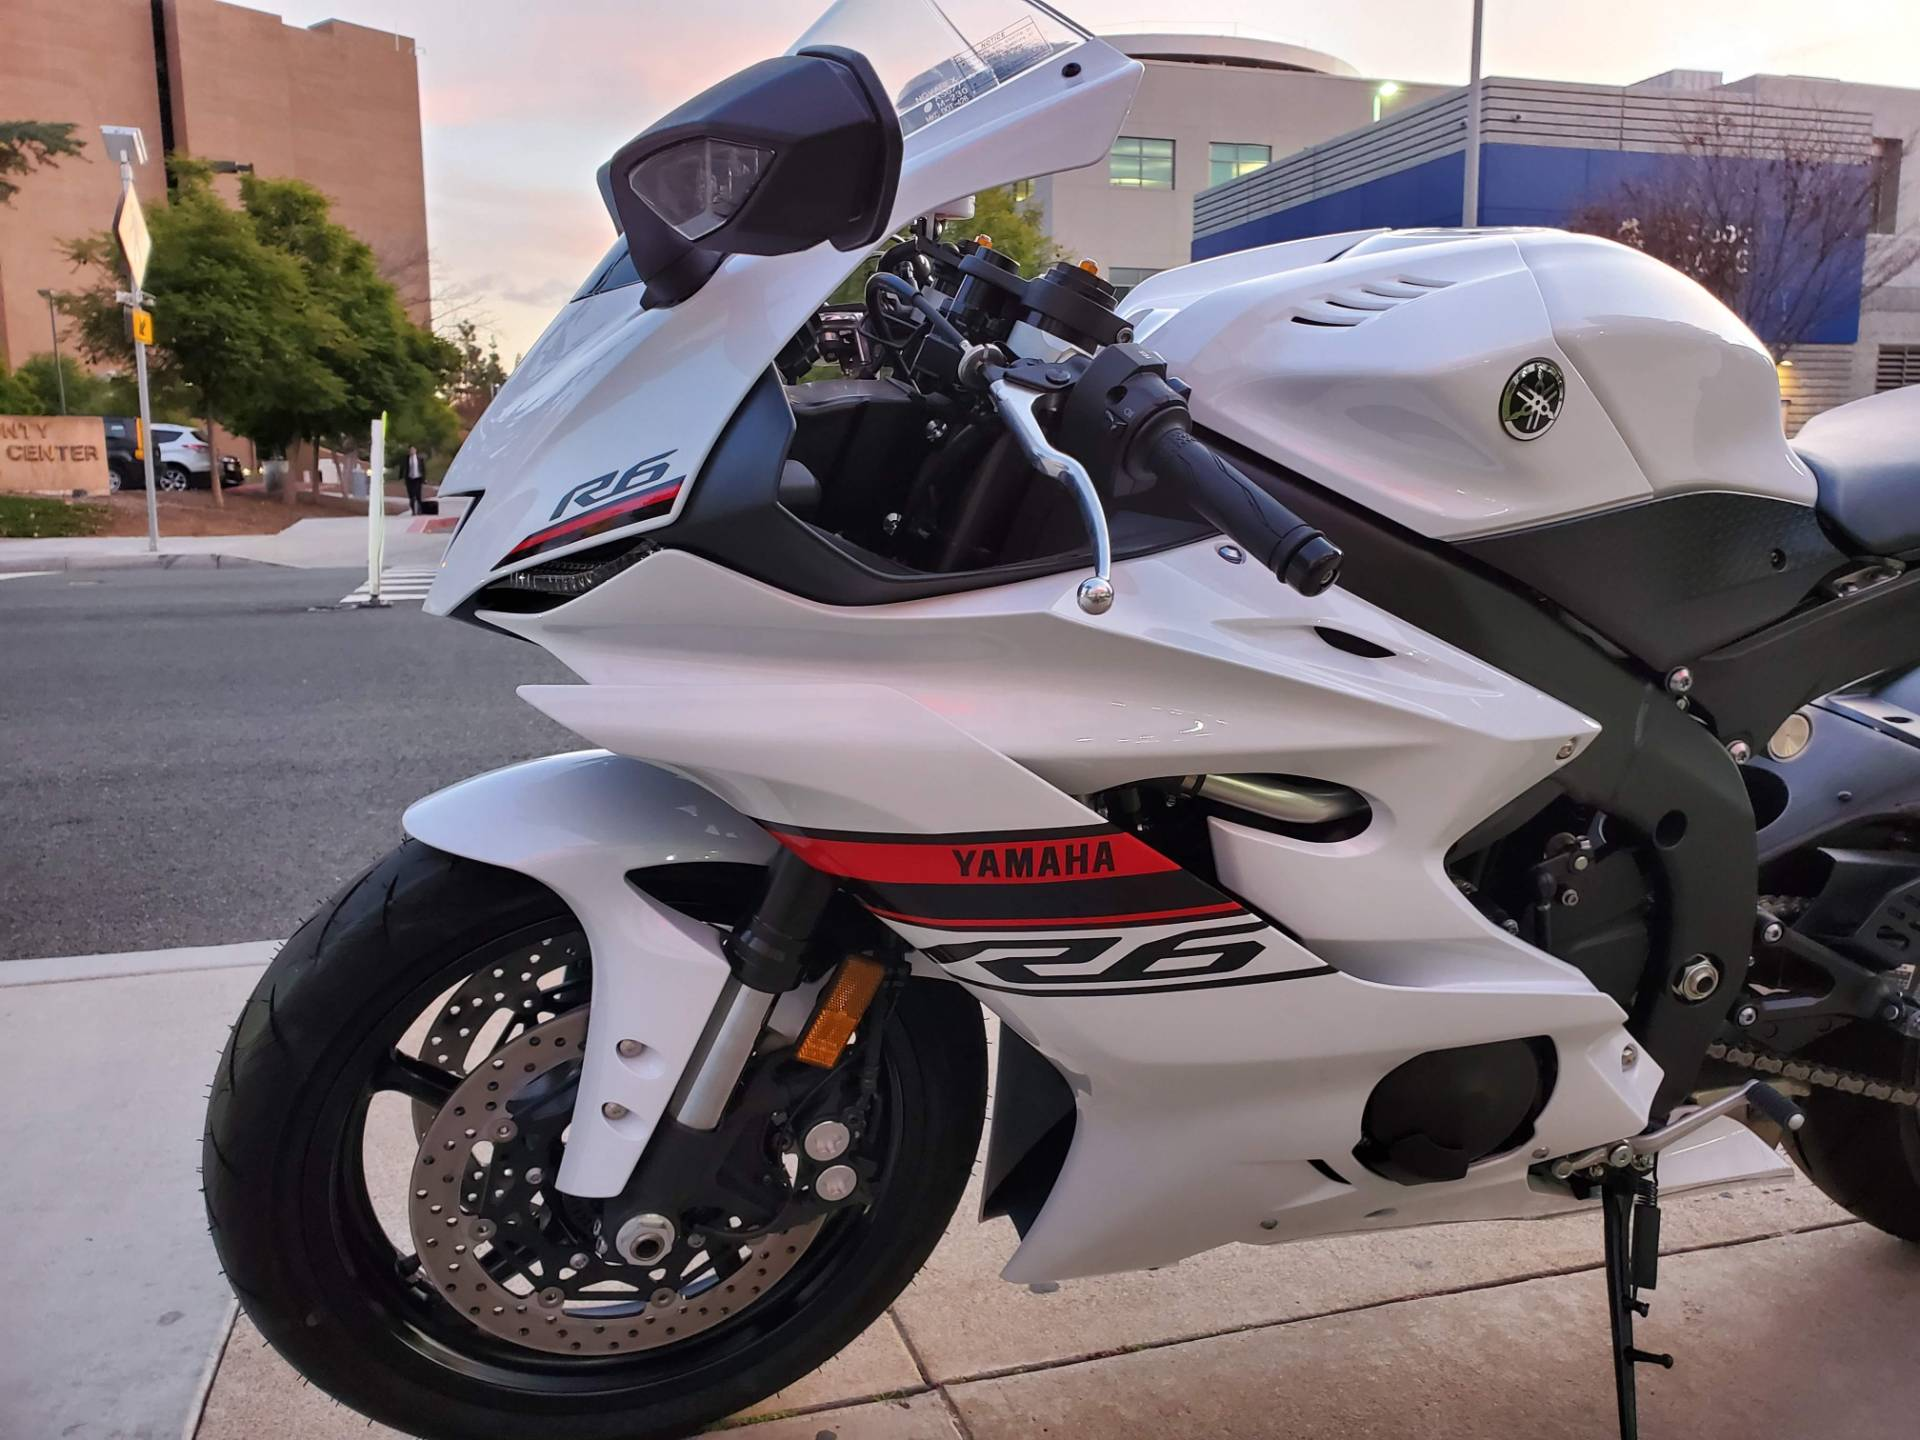 2019 Yamaha YZF-R6 11